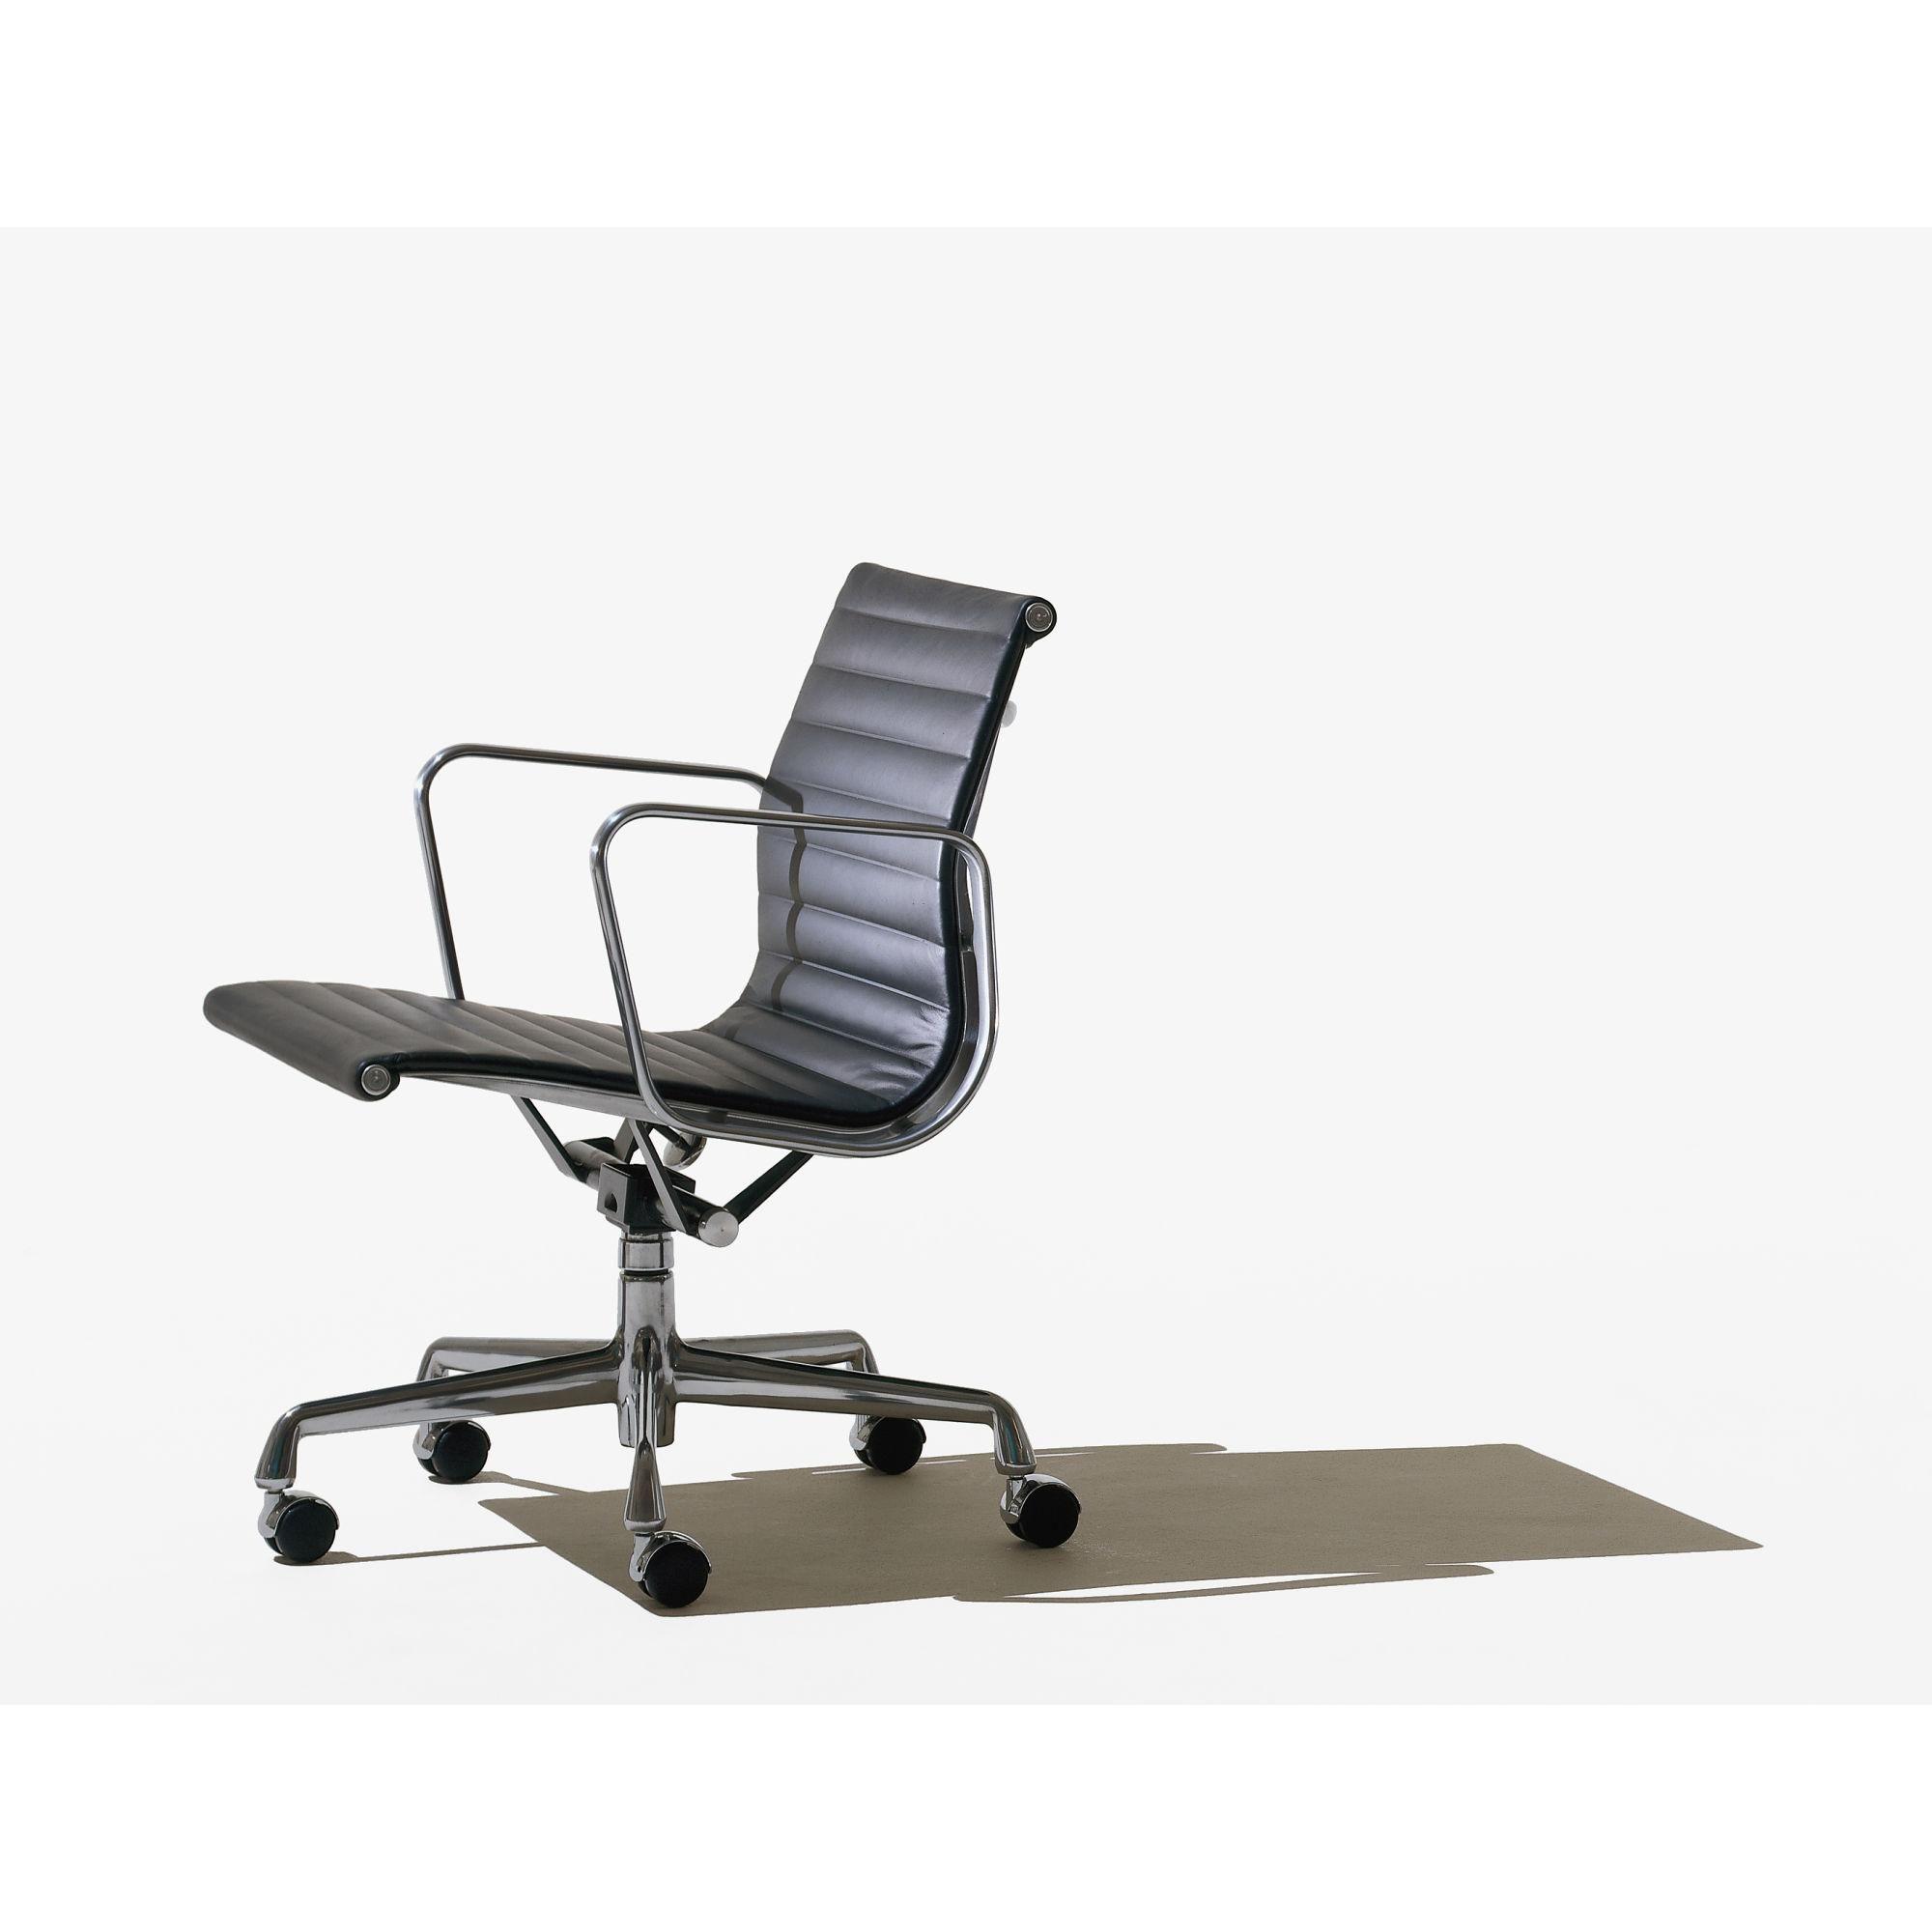 File 5742 Jpg Jpeg Image 2000x2000 Pixels Eames Management Chair Modern Office Chair Ergonomic Office Chair